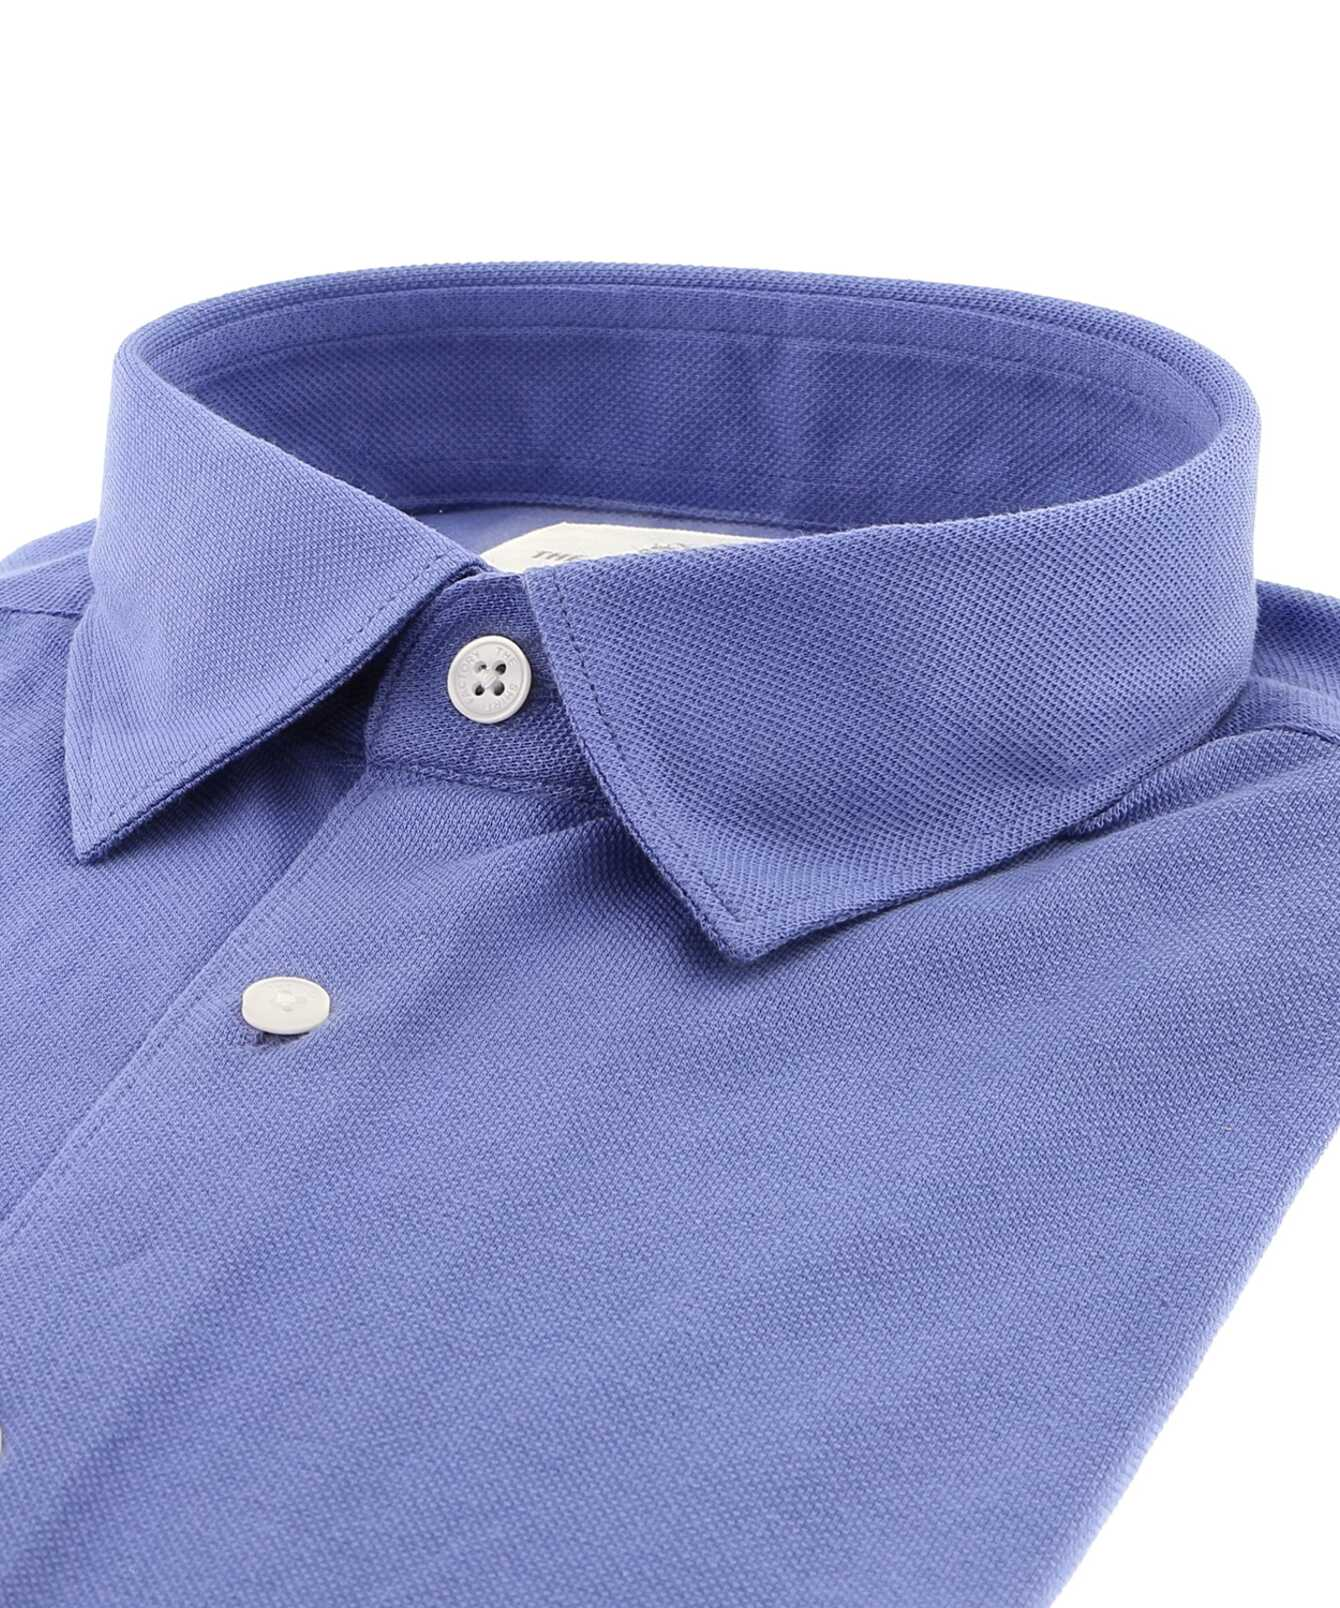 Shirt Royal Troon Pique Lilac The Shirt Factory